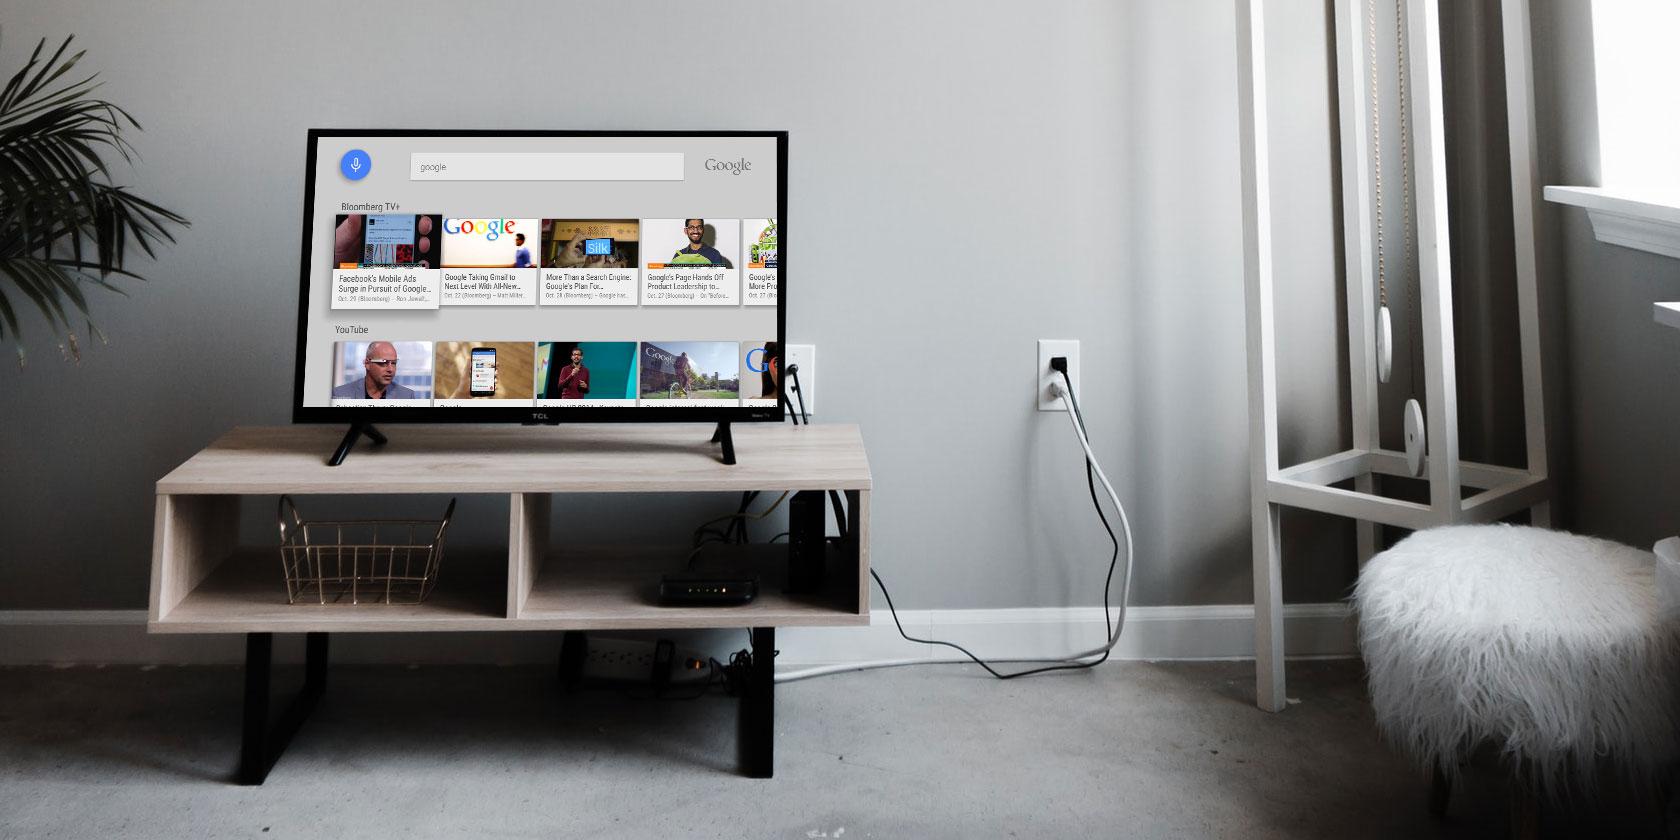 watch-free-live-tv